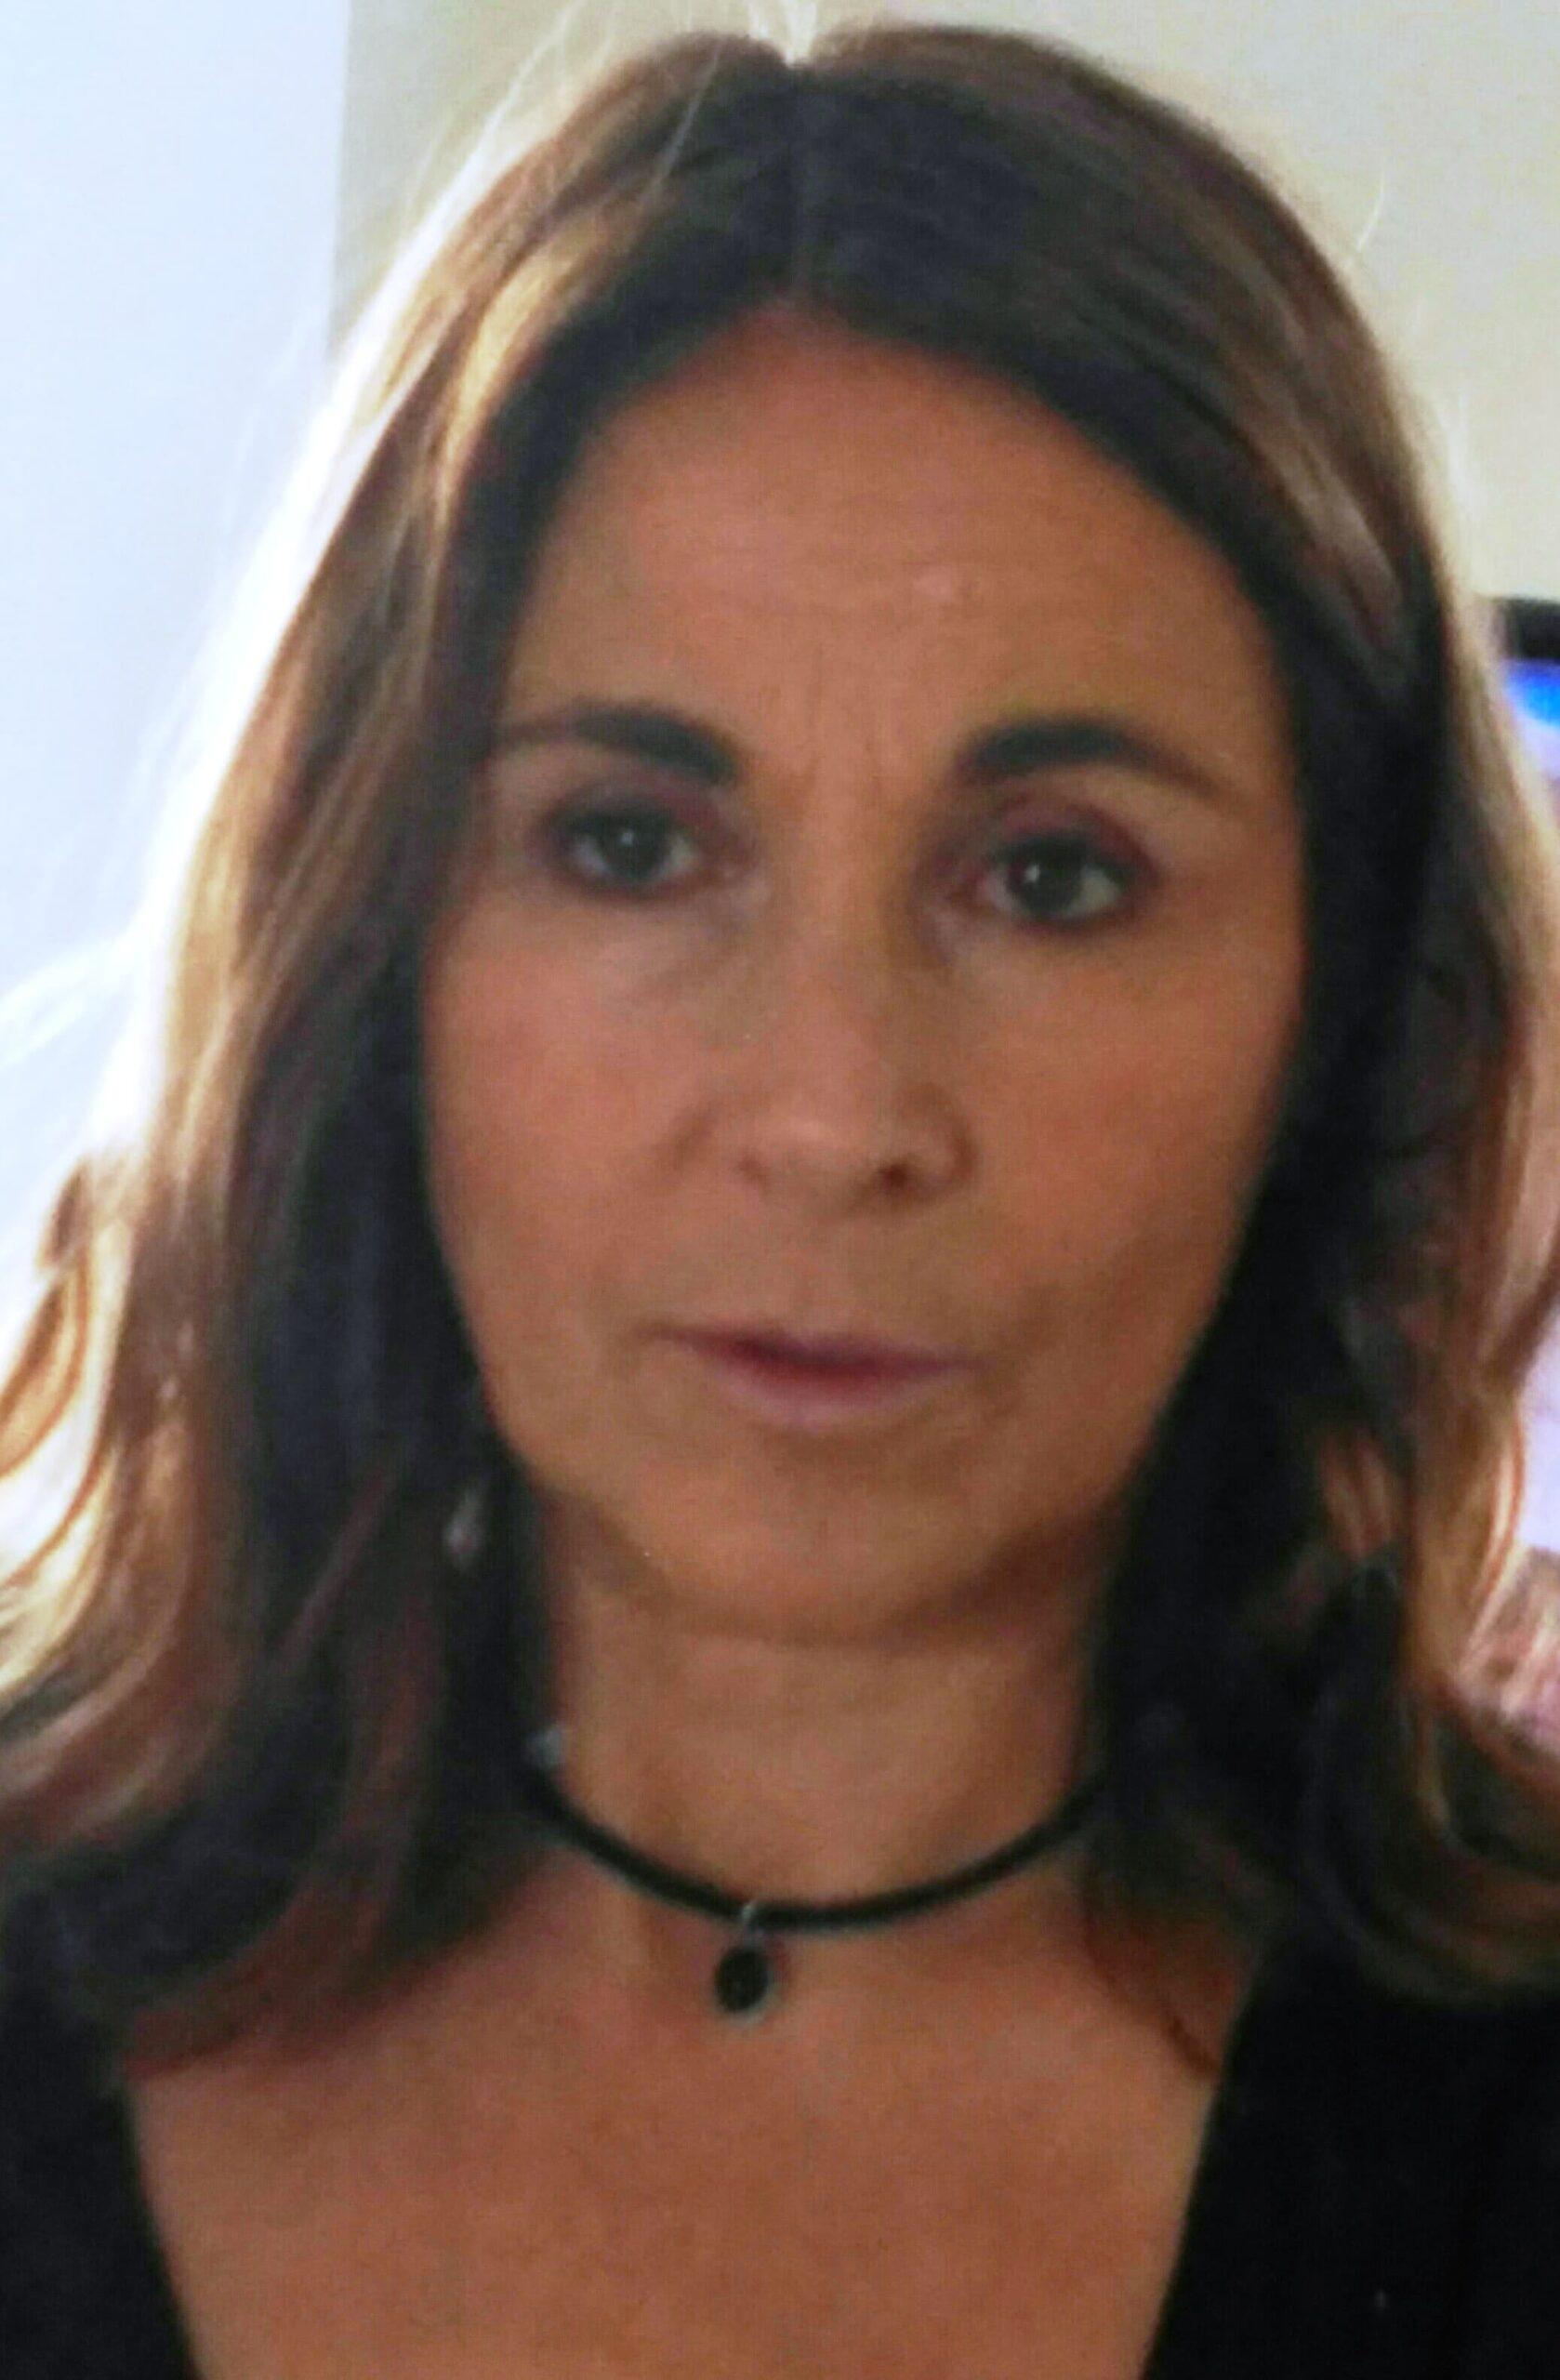 CARMEN VALLES GUERRA